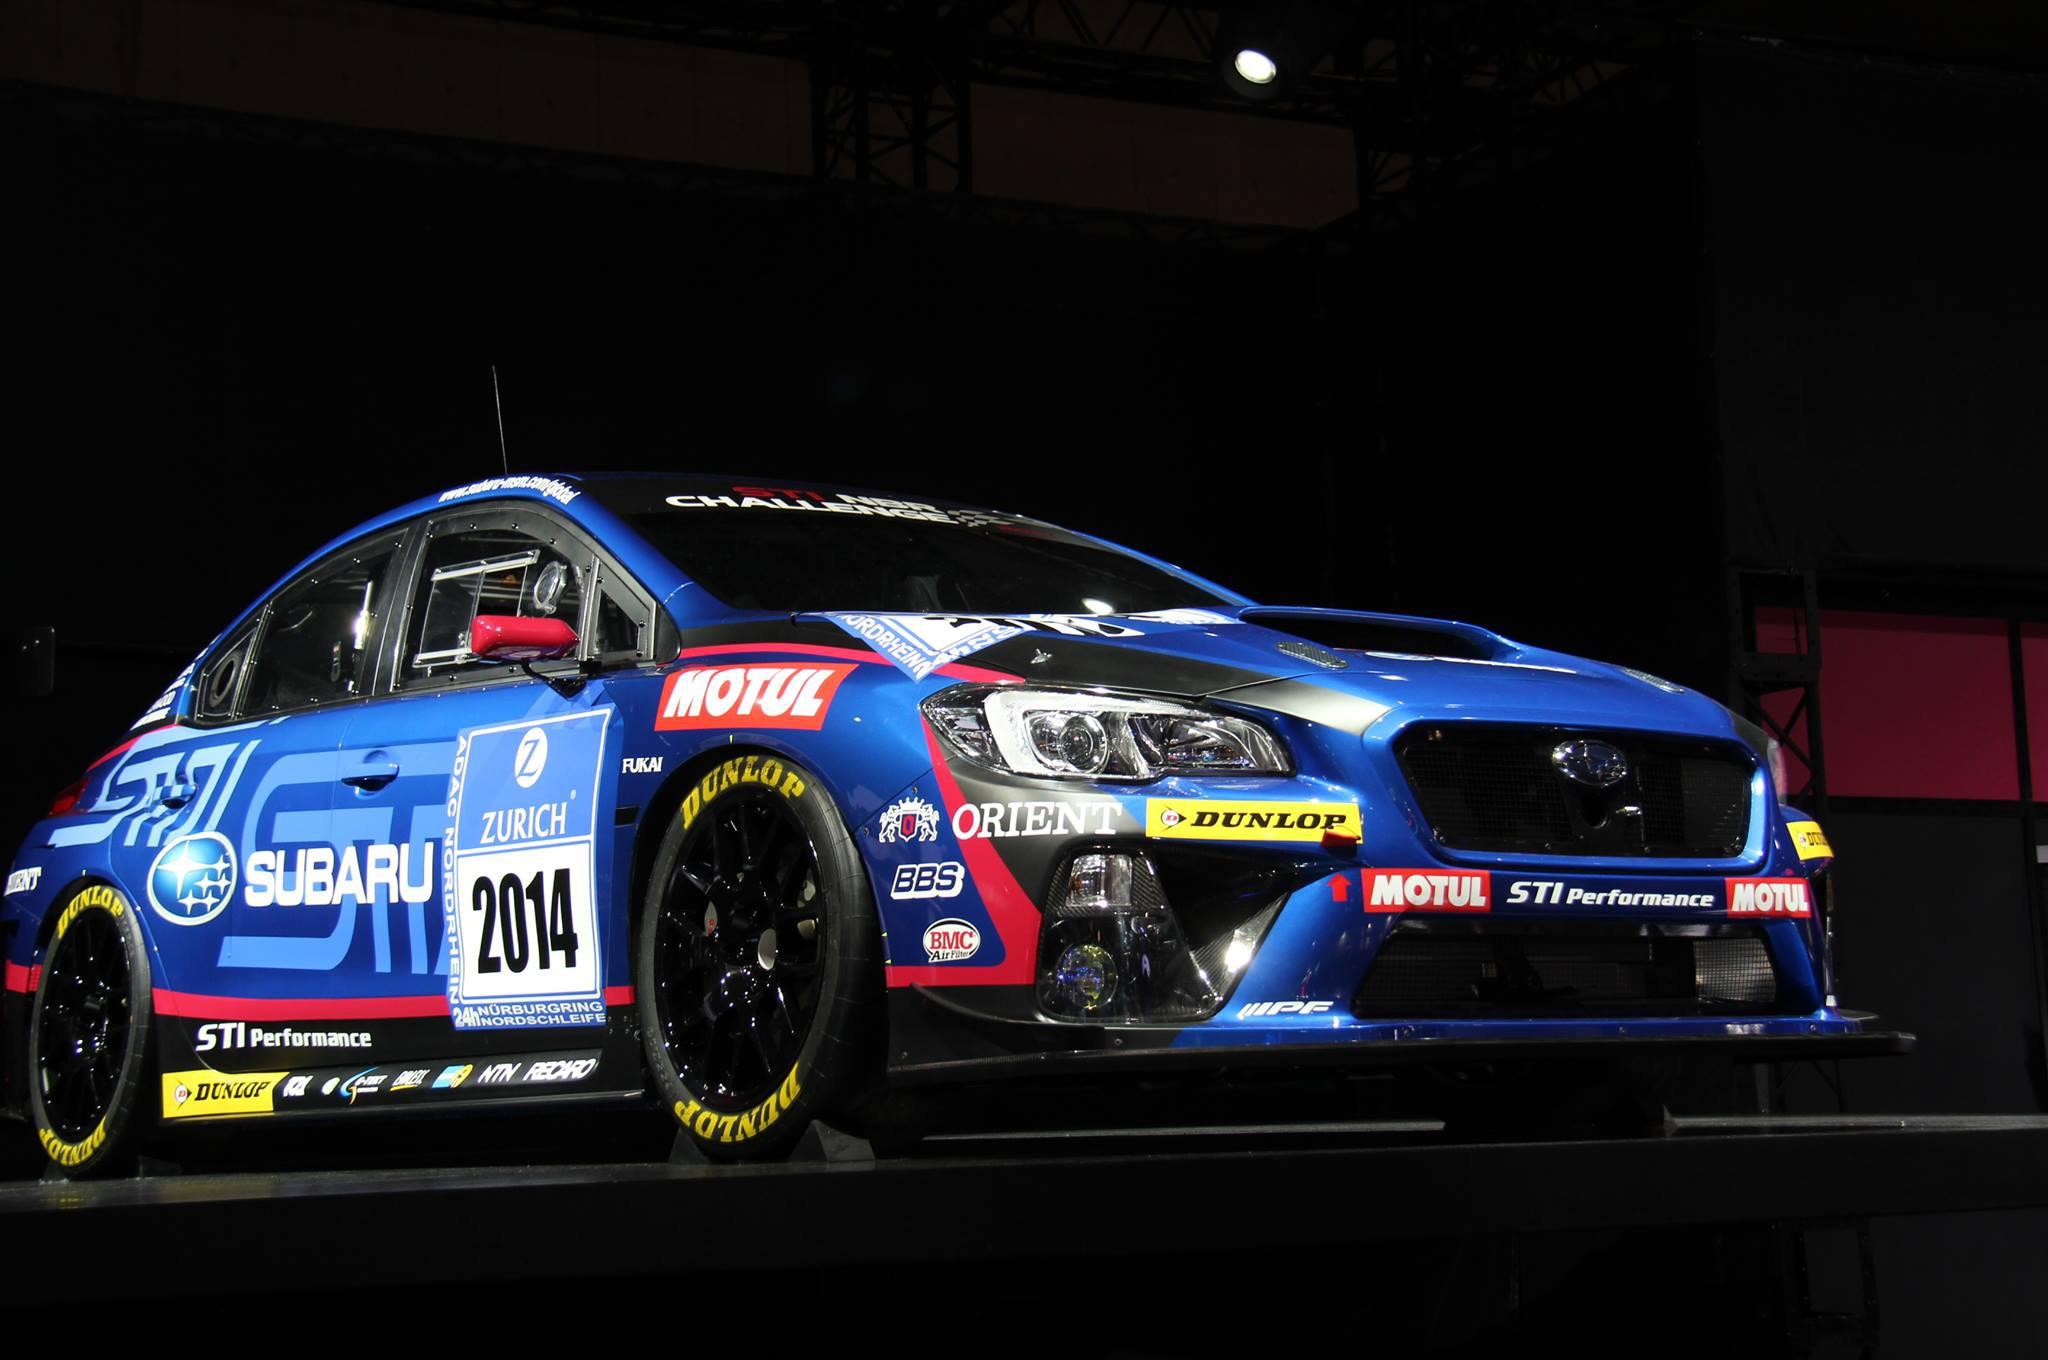 The Sti Race Car